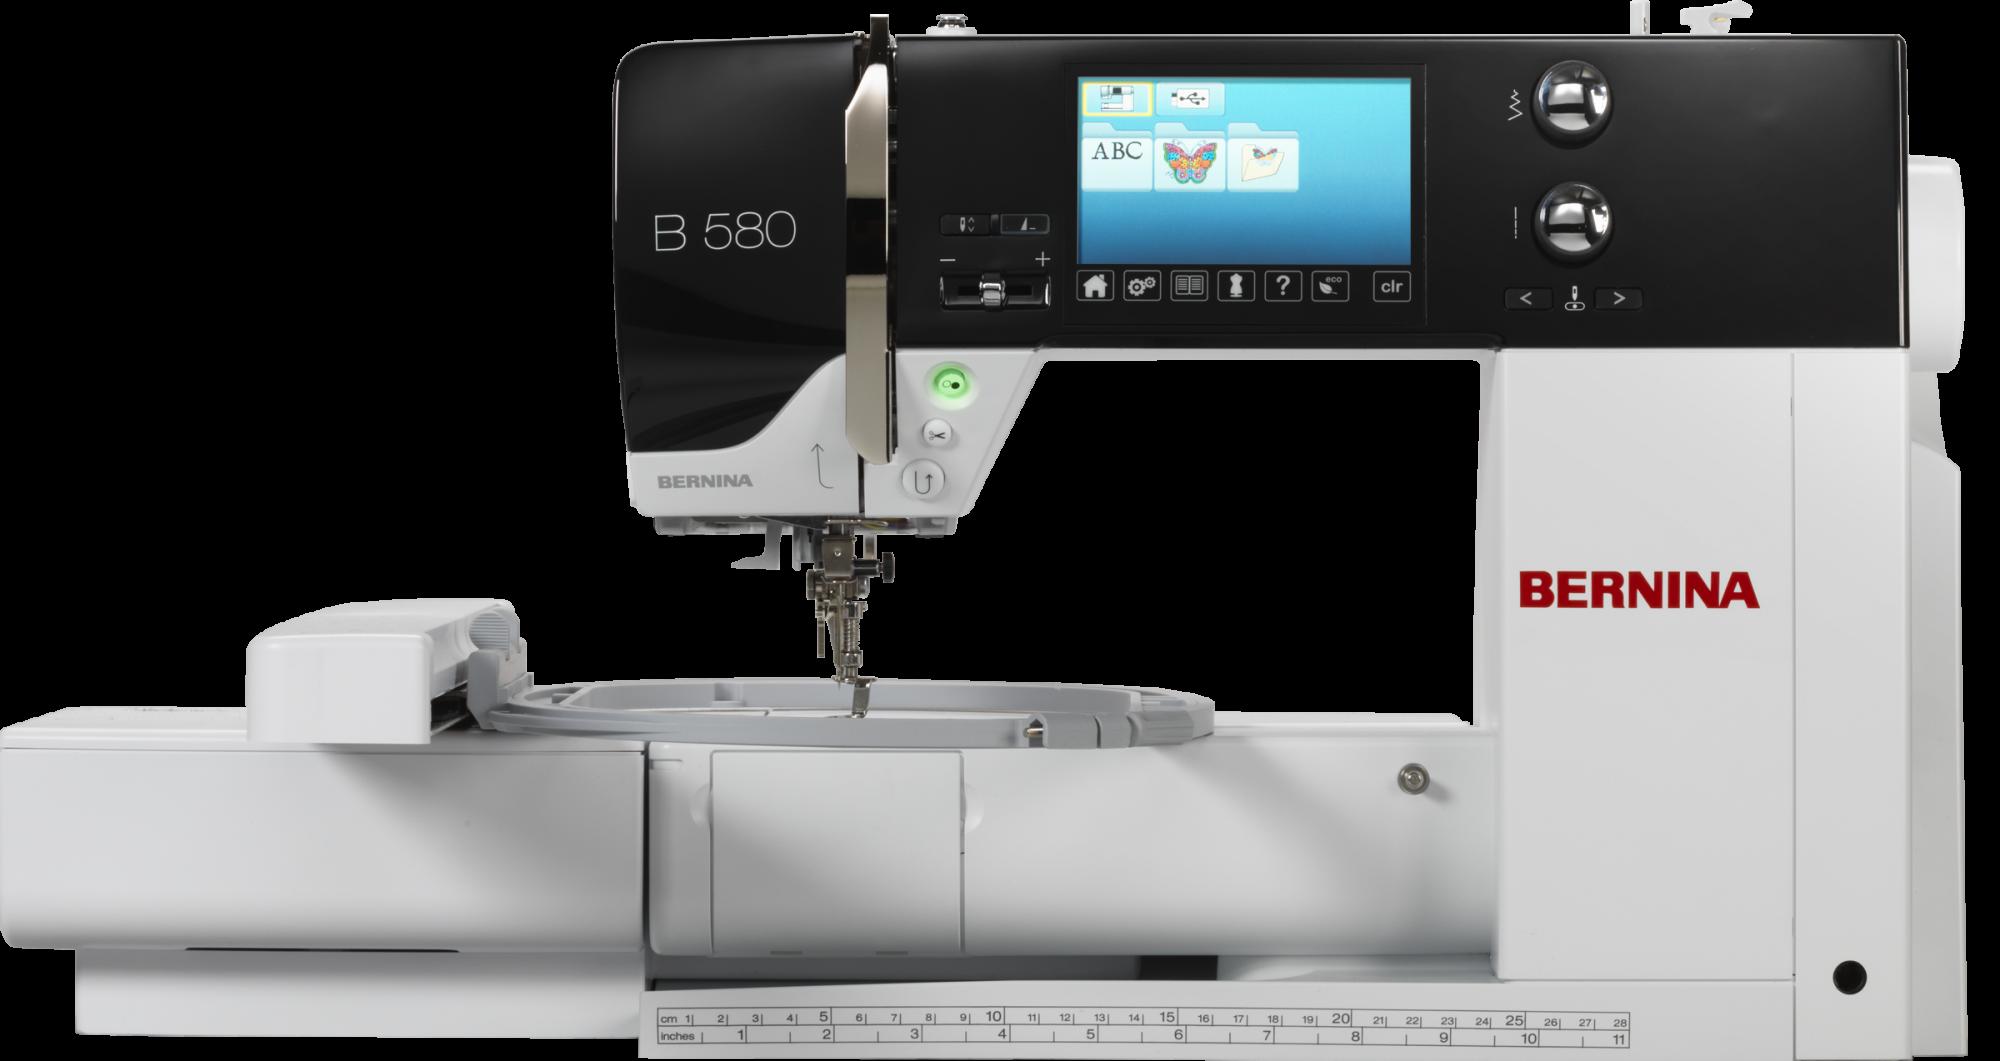 Bernina 580 Sewing Machine